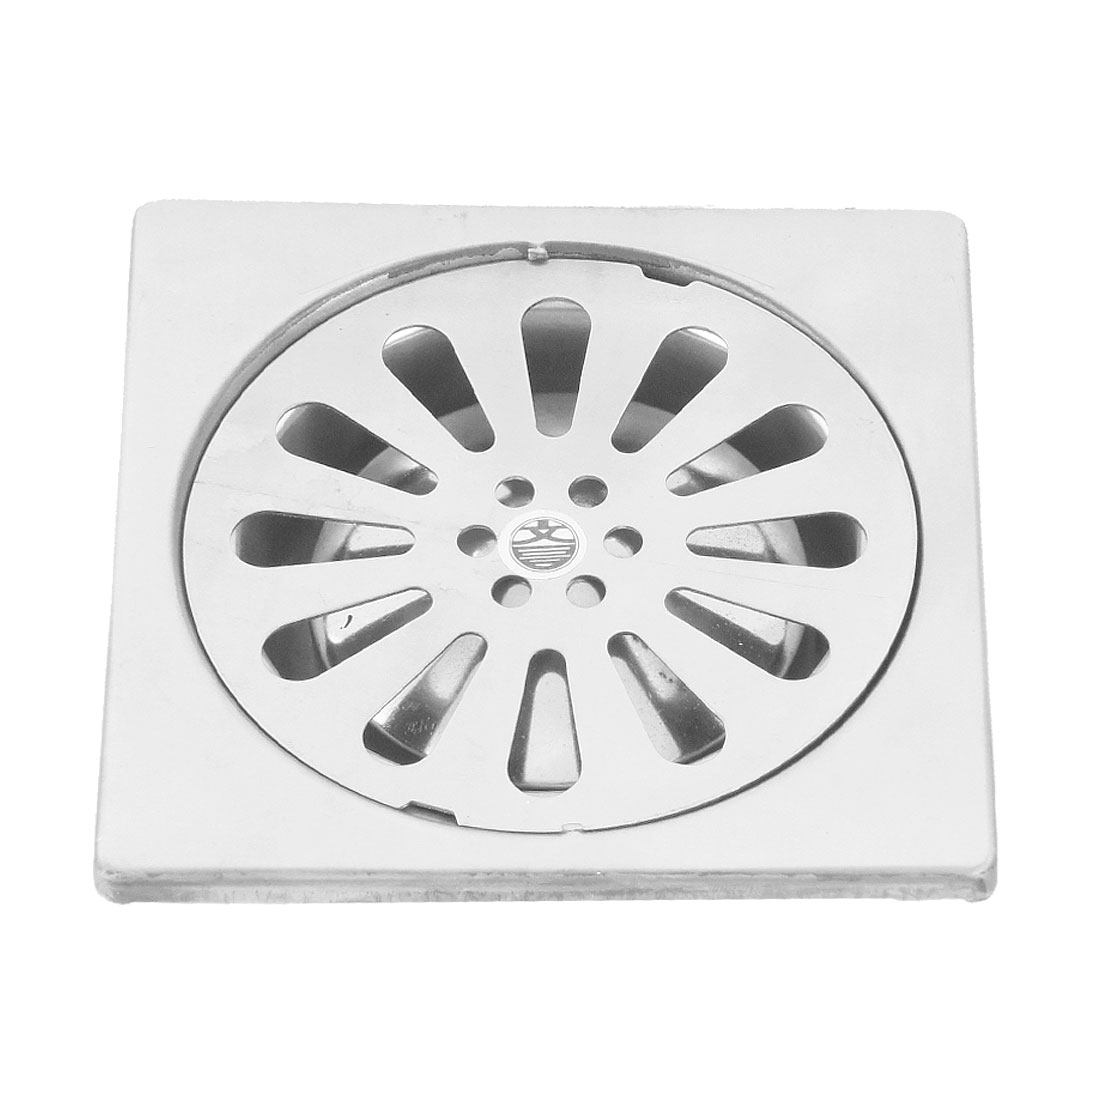 "Bathroom 4"" Silver Tone Stainless Steel Square Sink Floor Drain"